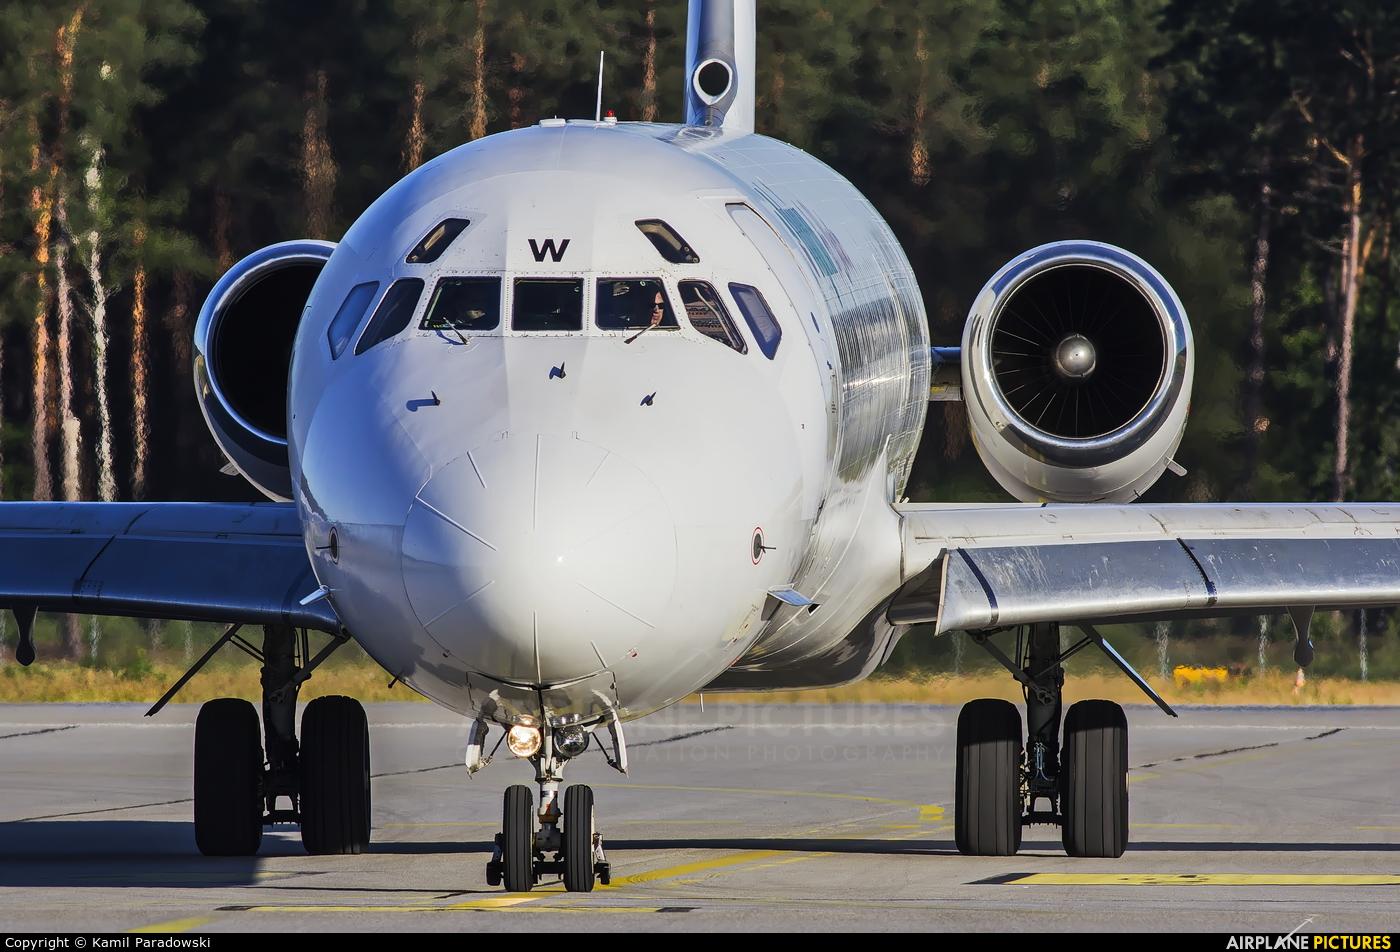 Bulgarian Air Charter LZ-LDW aircraft at Olsztyn Mazury Airport (Szymany)